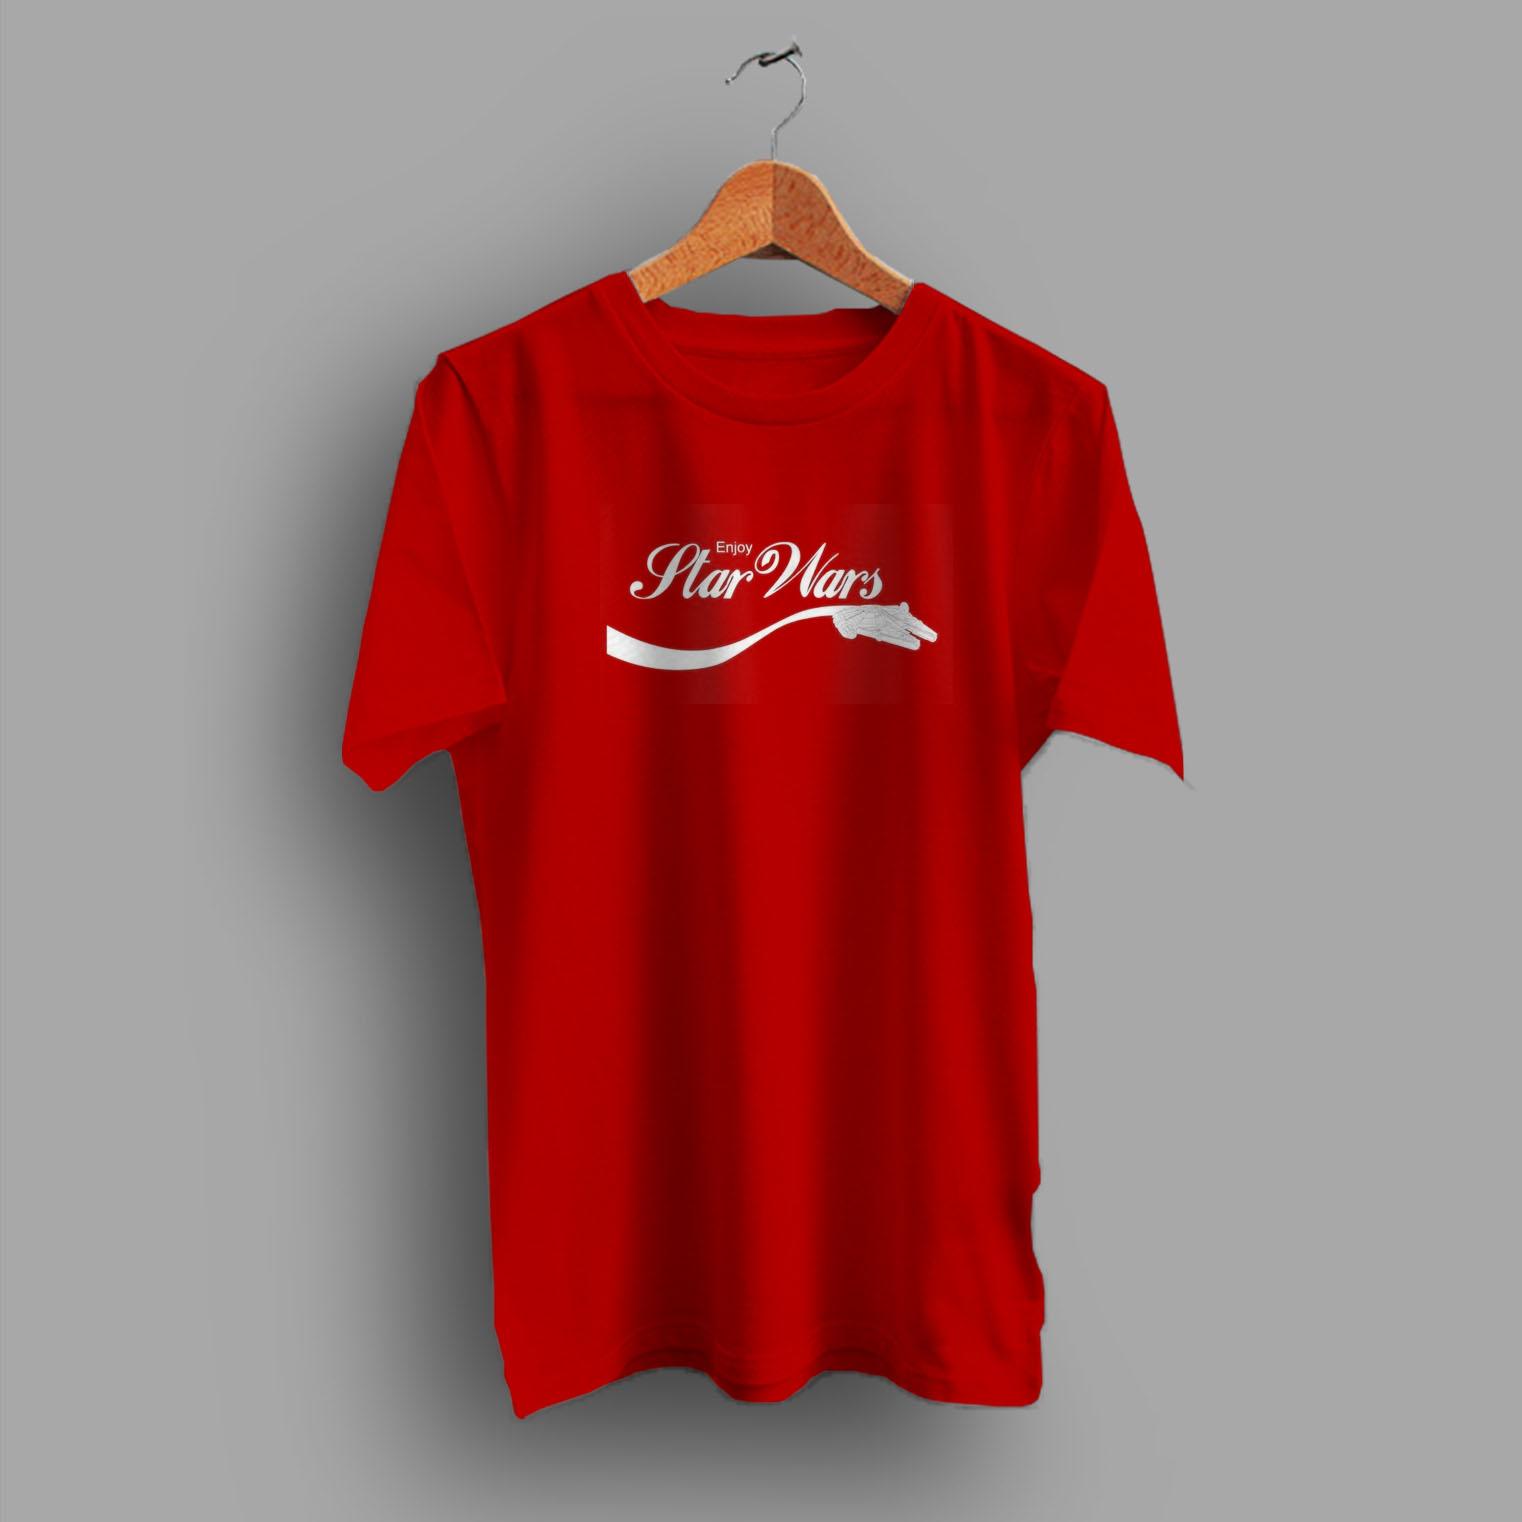 e19f56b2847 Enjoy Star Wars Coca Cola Parody T Shirt - Hotvero